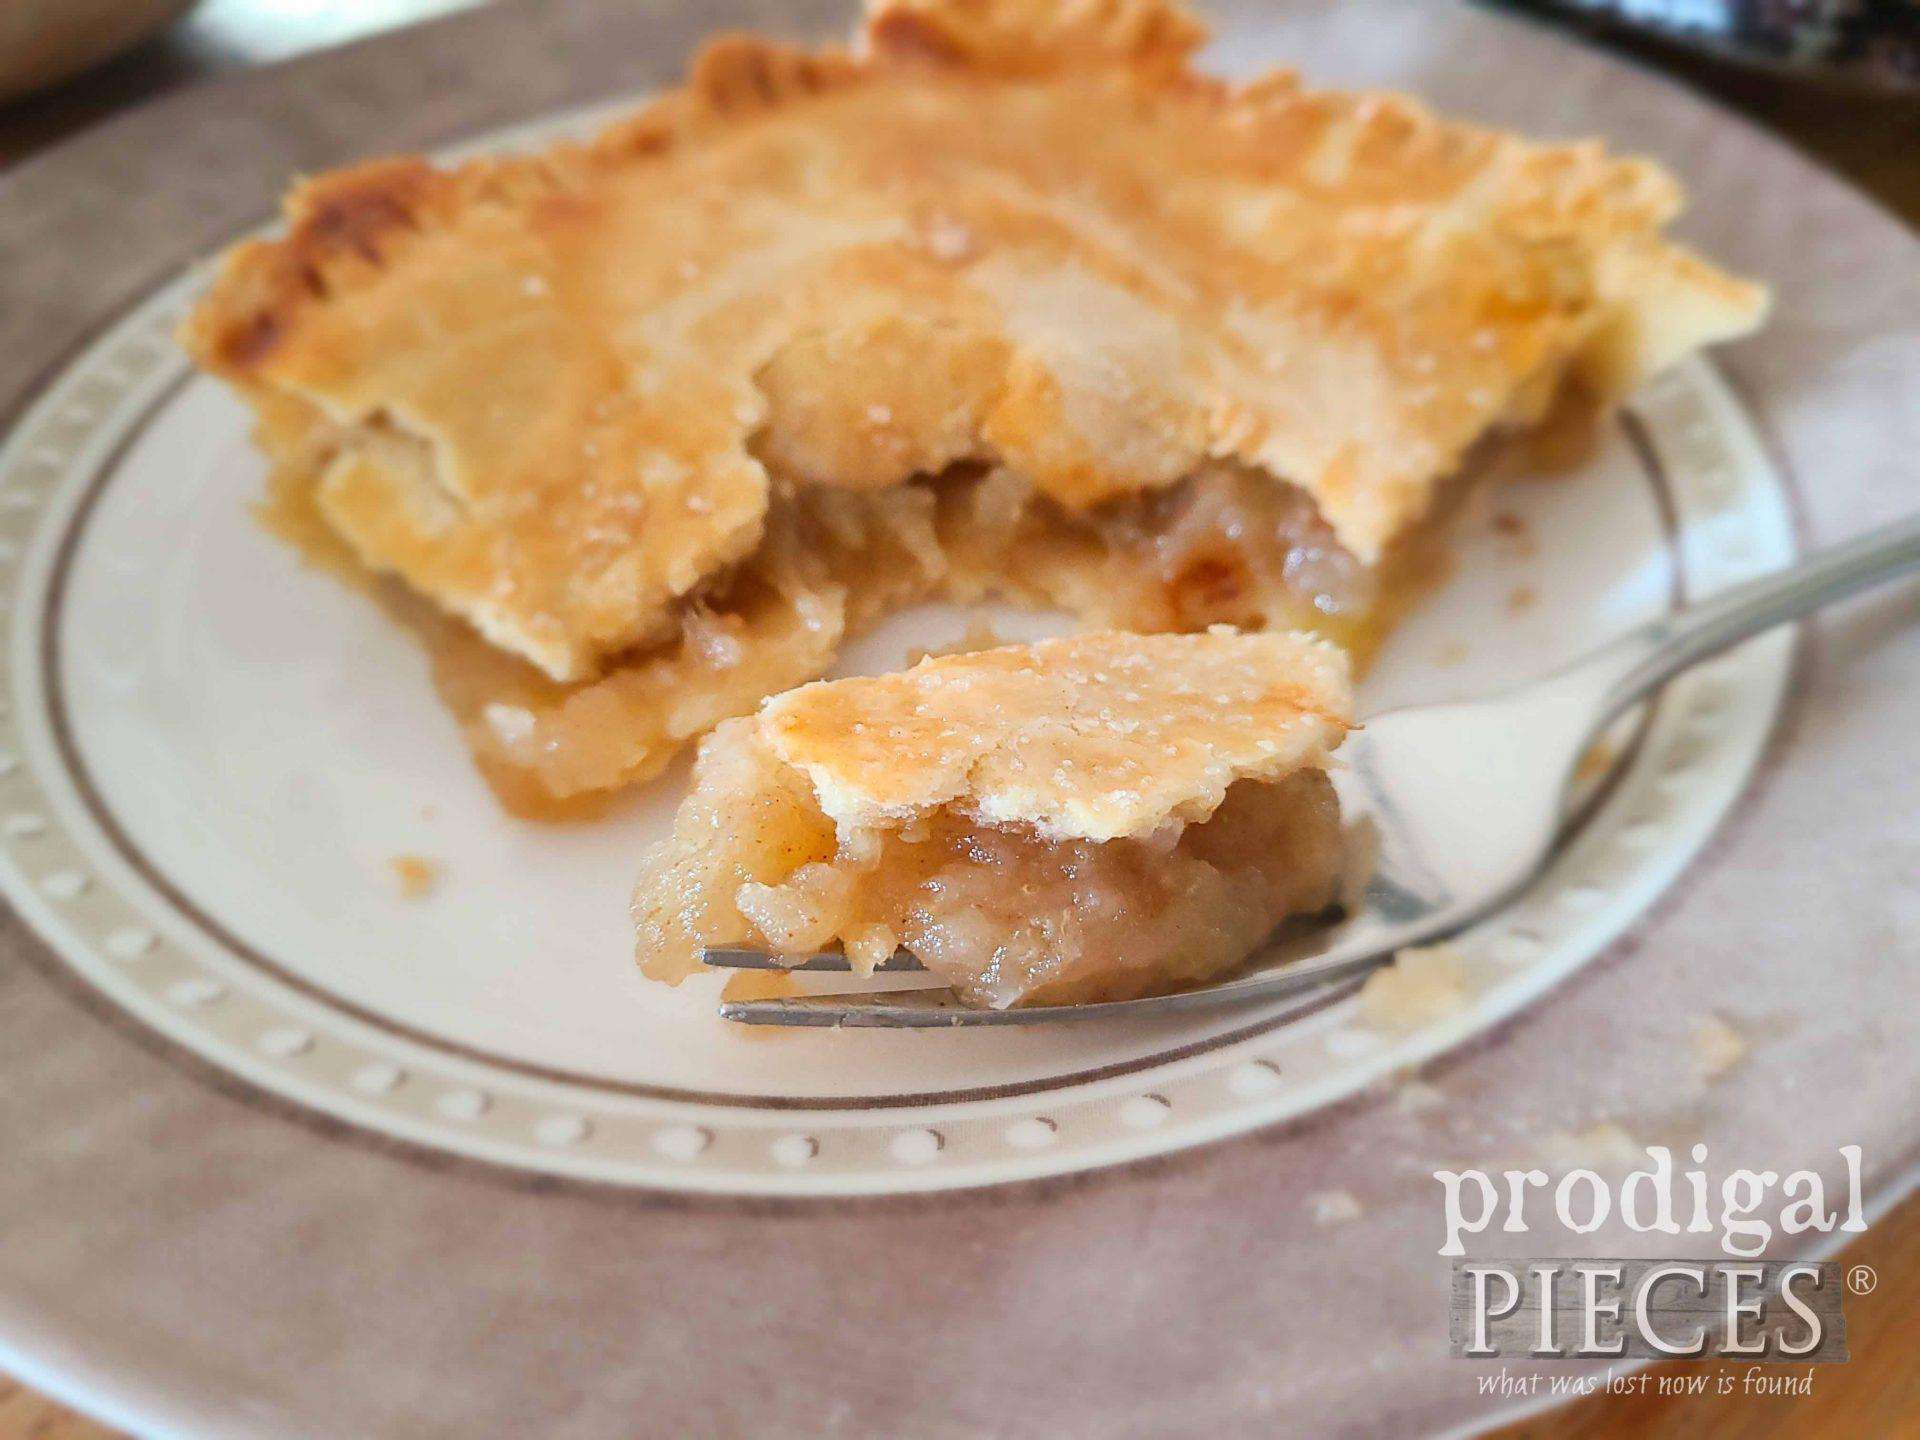 Handmade Apple Jack Dessert with Video Recipe by Larissa of Prodigal Pieces   prodigalpieces.com #prodigalpieces #food #recipe #dessert #apple